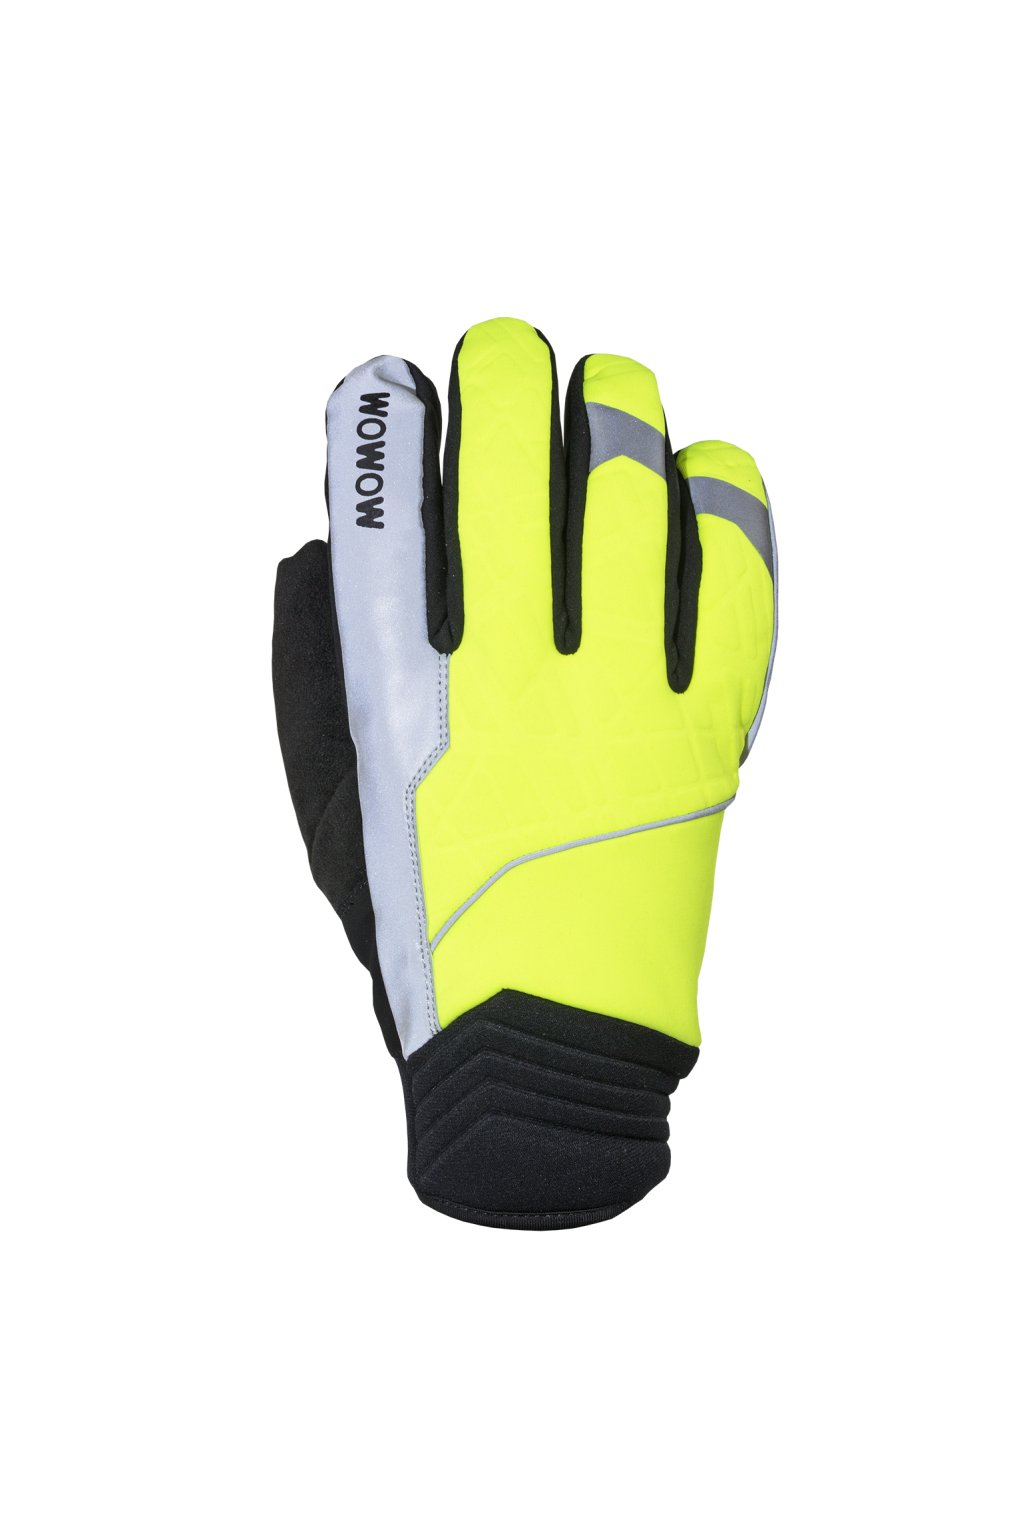 WOWOW rukavice AVALANCHE